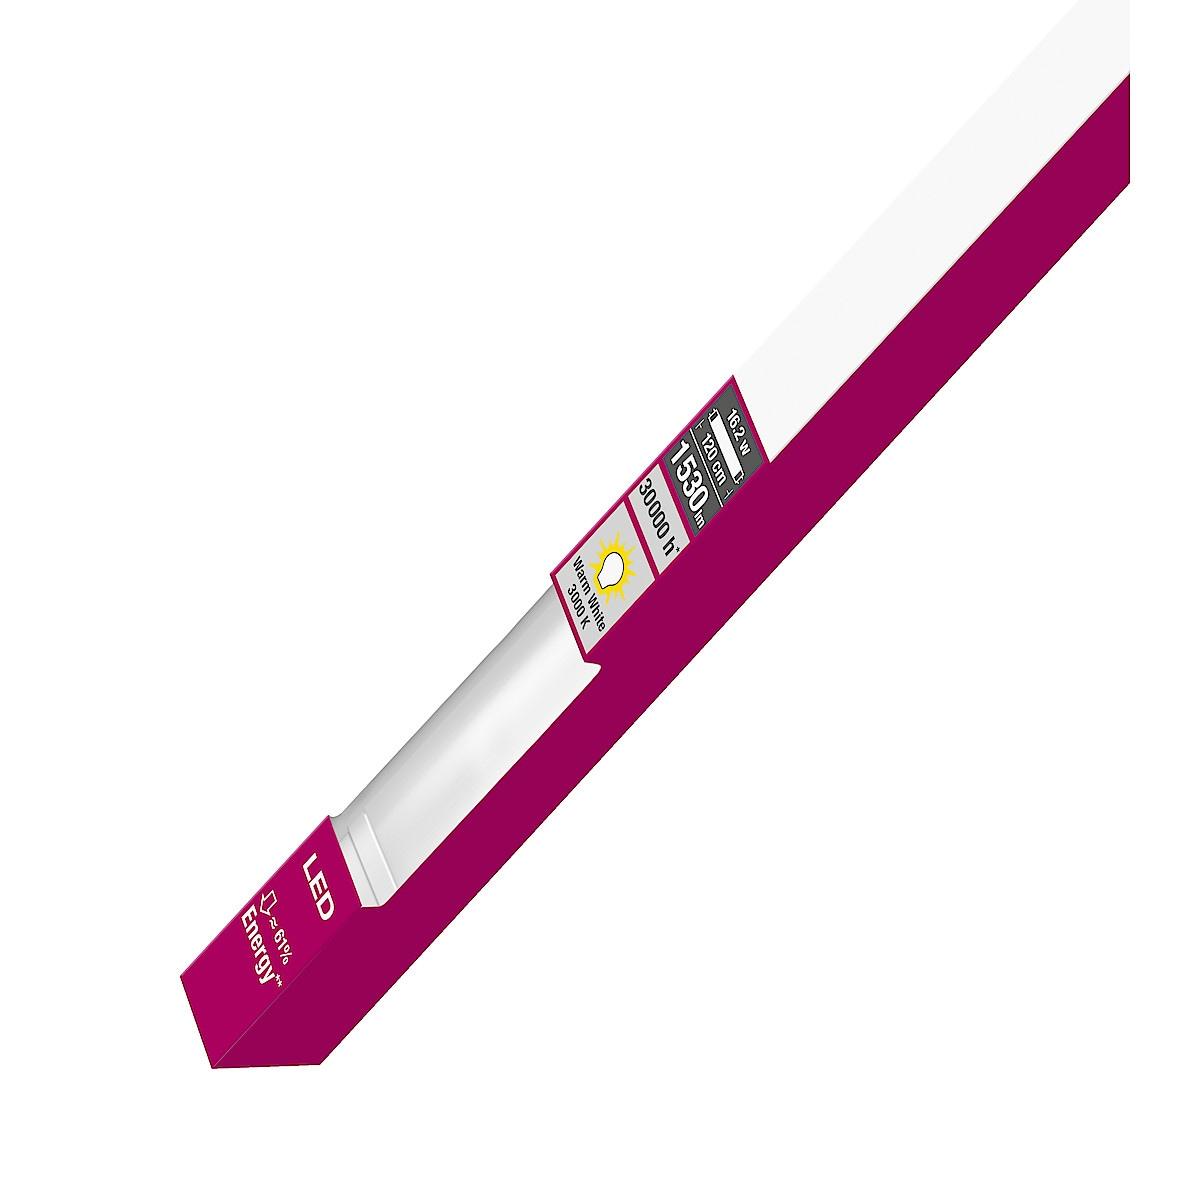 LED-lysrör SubstiTUBE 162 W 1212 mm Osram